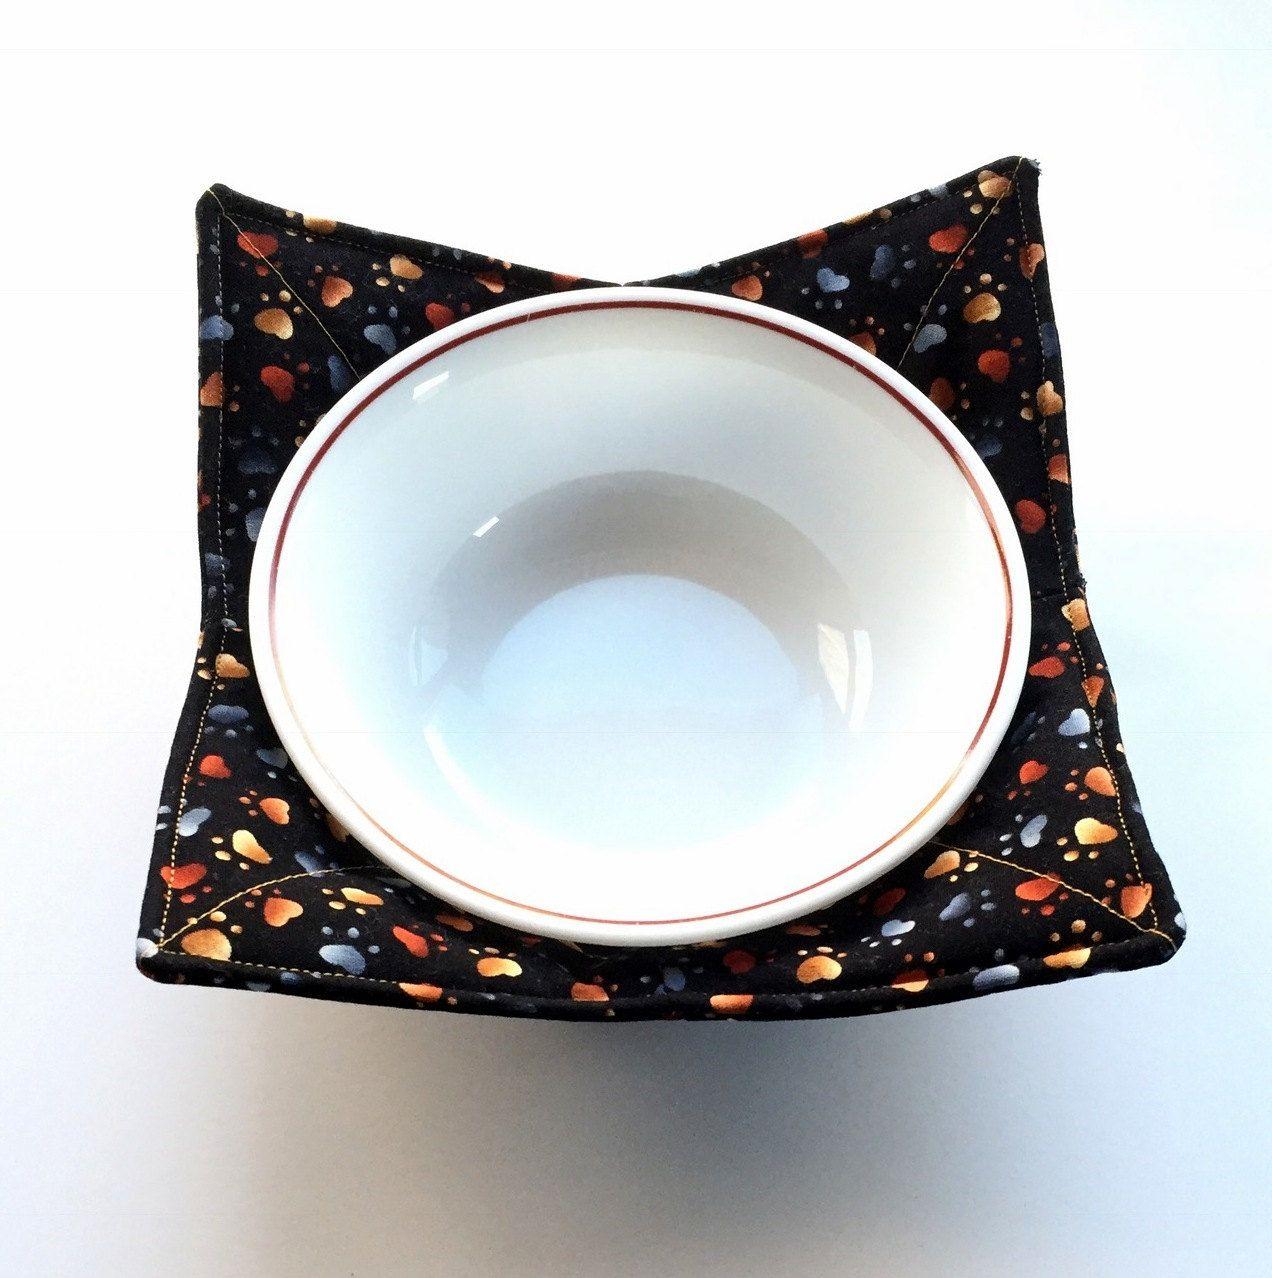 Cozy Microwave Bowl Holder Cat Owner Gift Microwave Cozy Cat Lover Gift Microwave Bowl Cozy Kitchen Gift Gift for Cat Lover